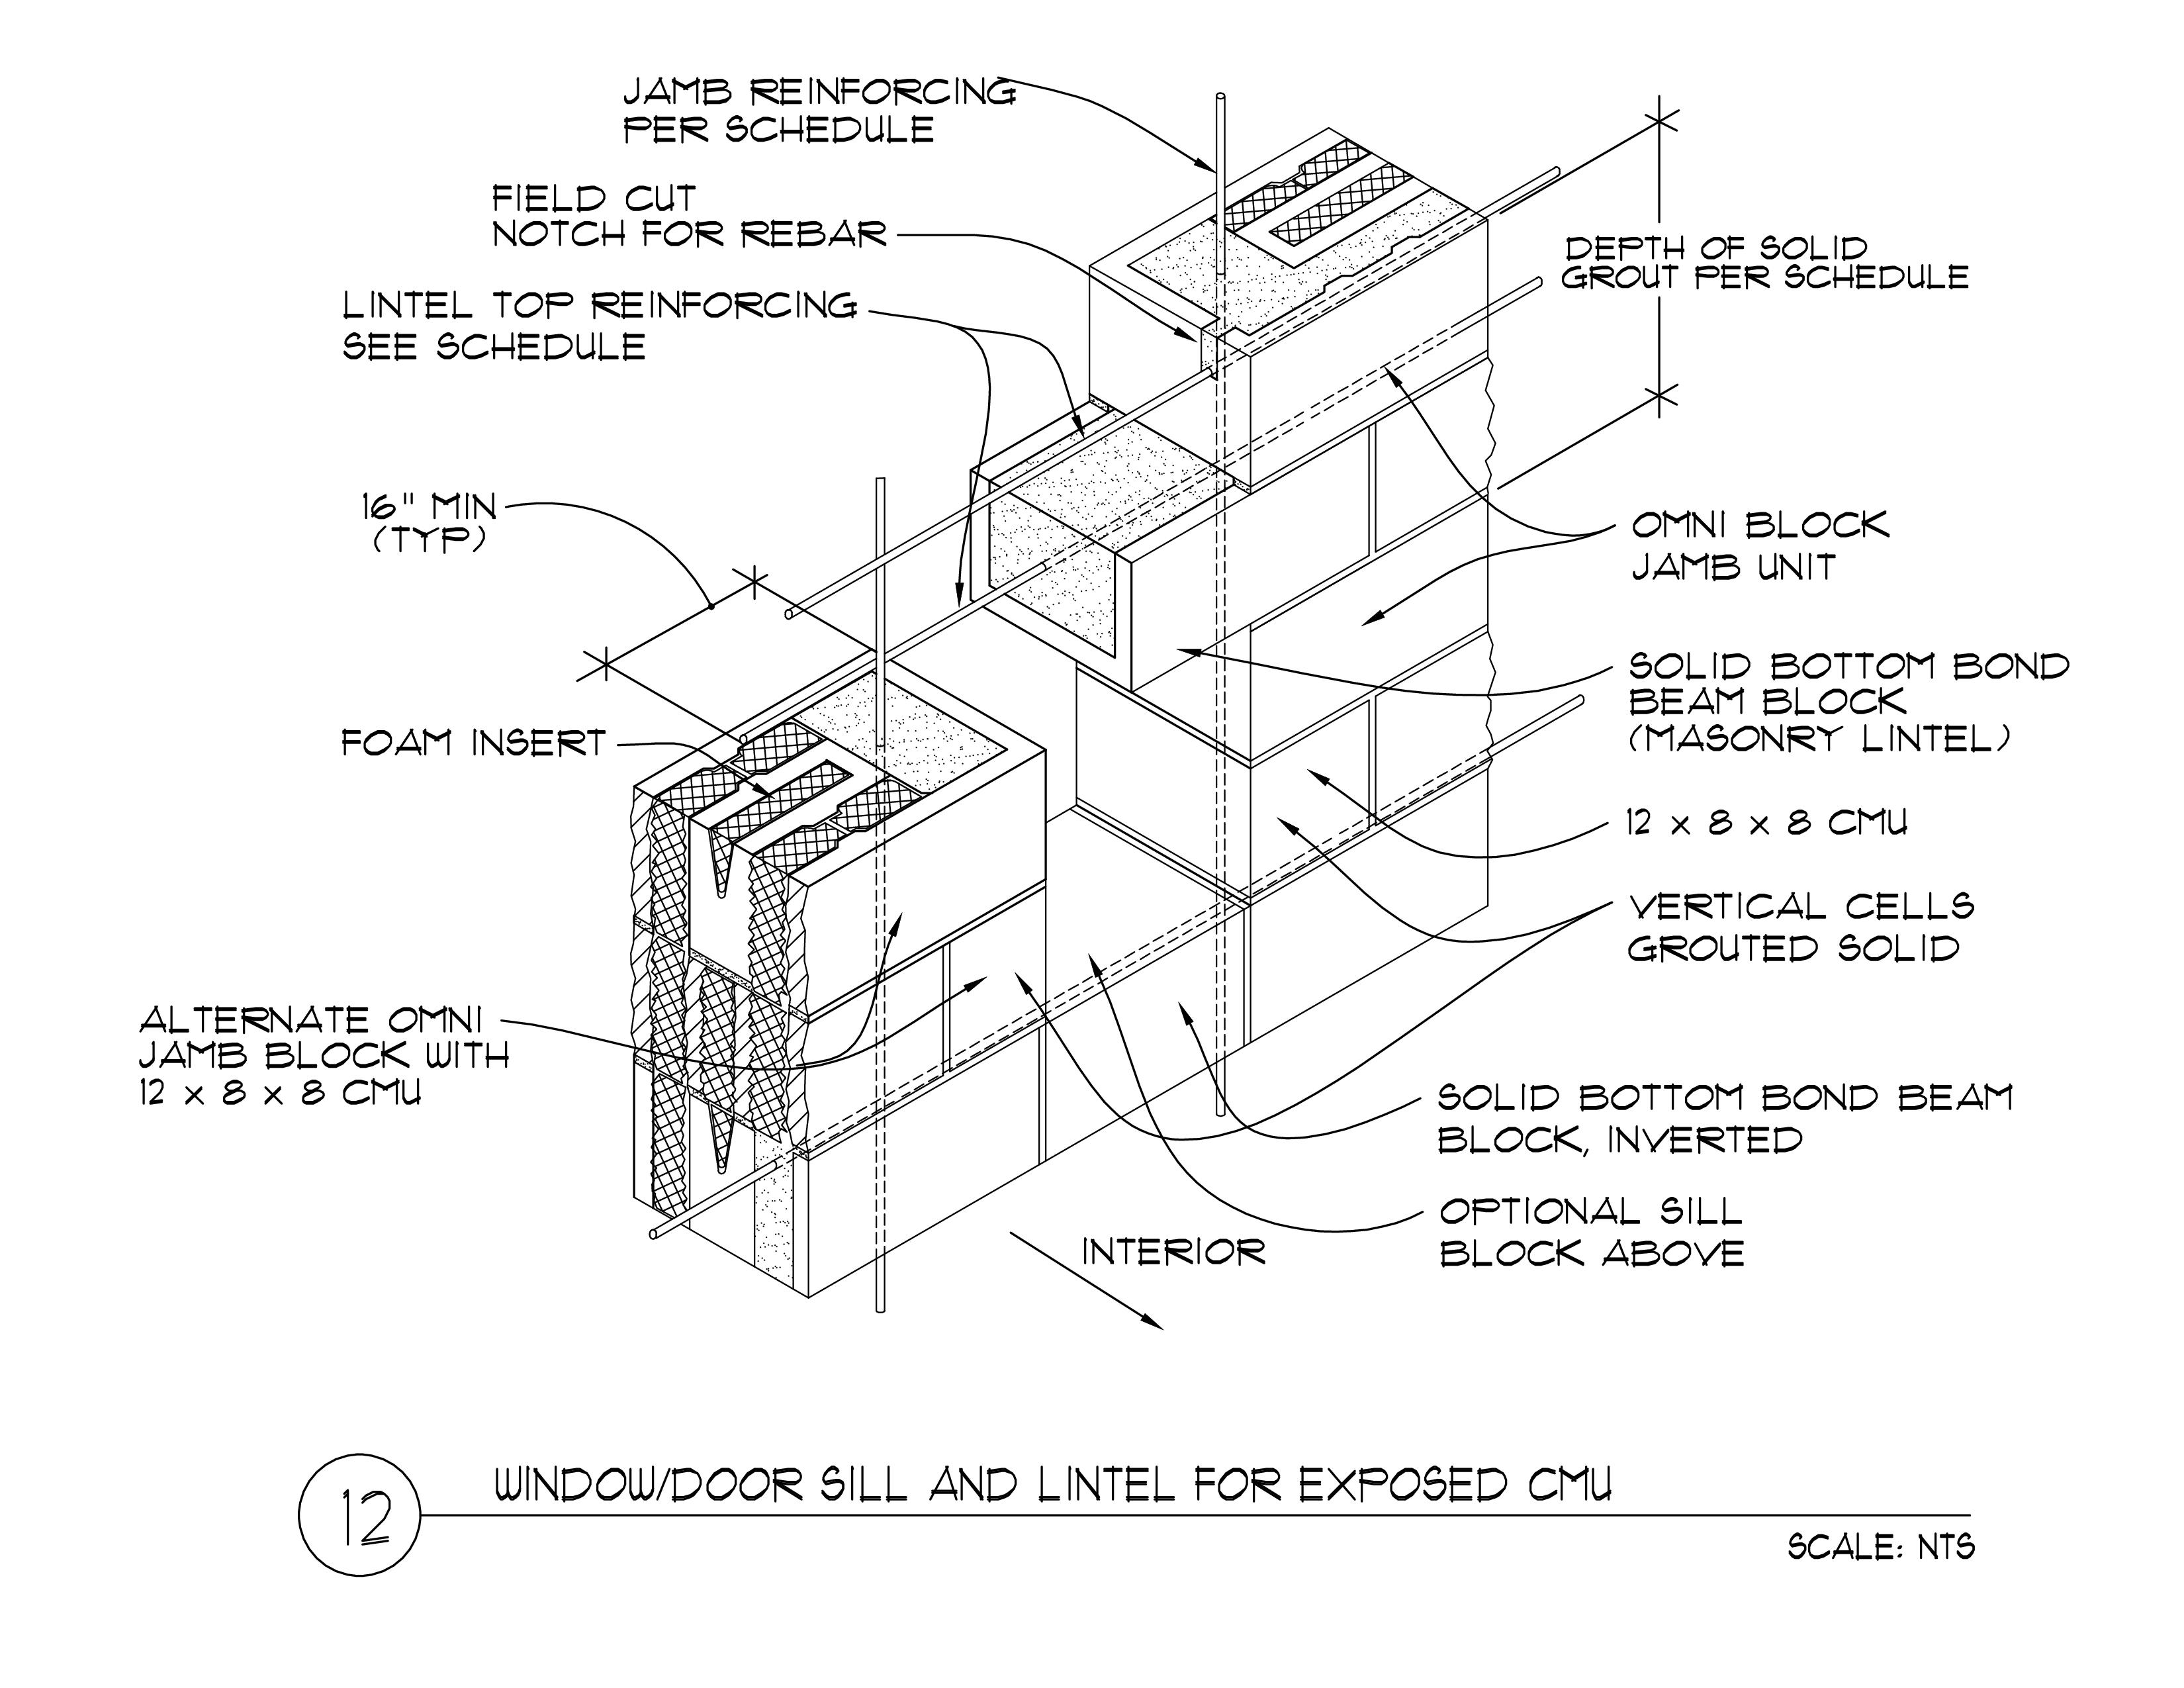 Detail 12 12x8x16-1  sc 1 st  Omni Block & Window / Door Masonry Lintel 12 x 8 x 16 - Omniblock